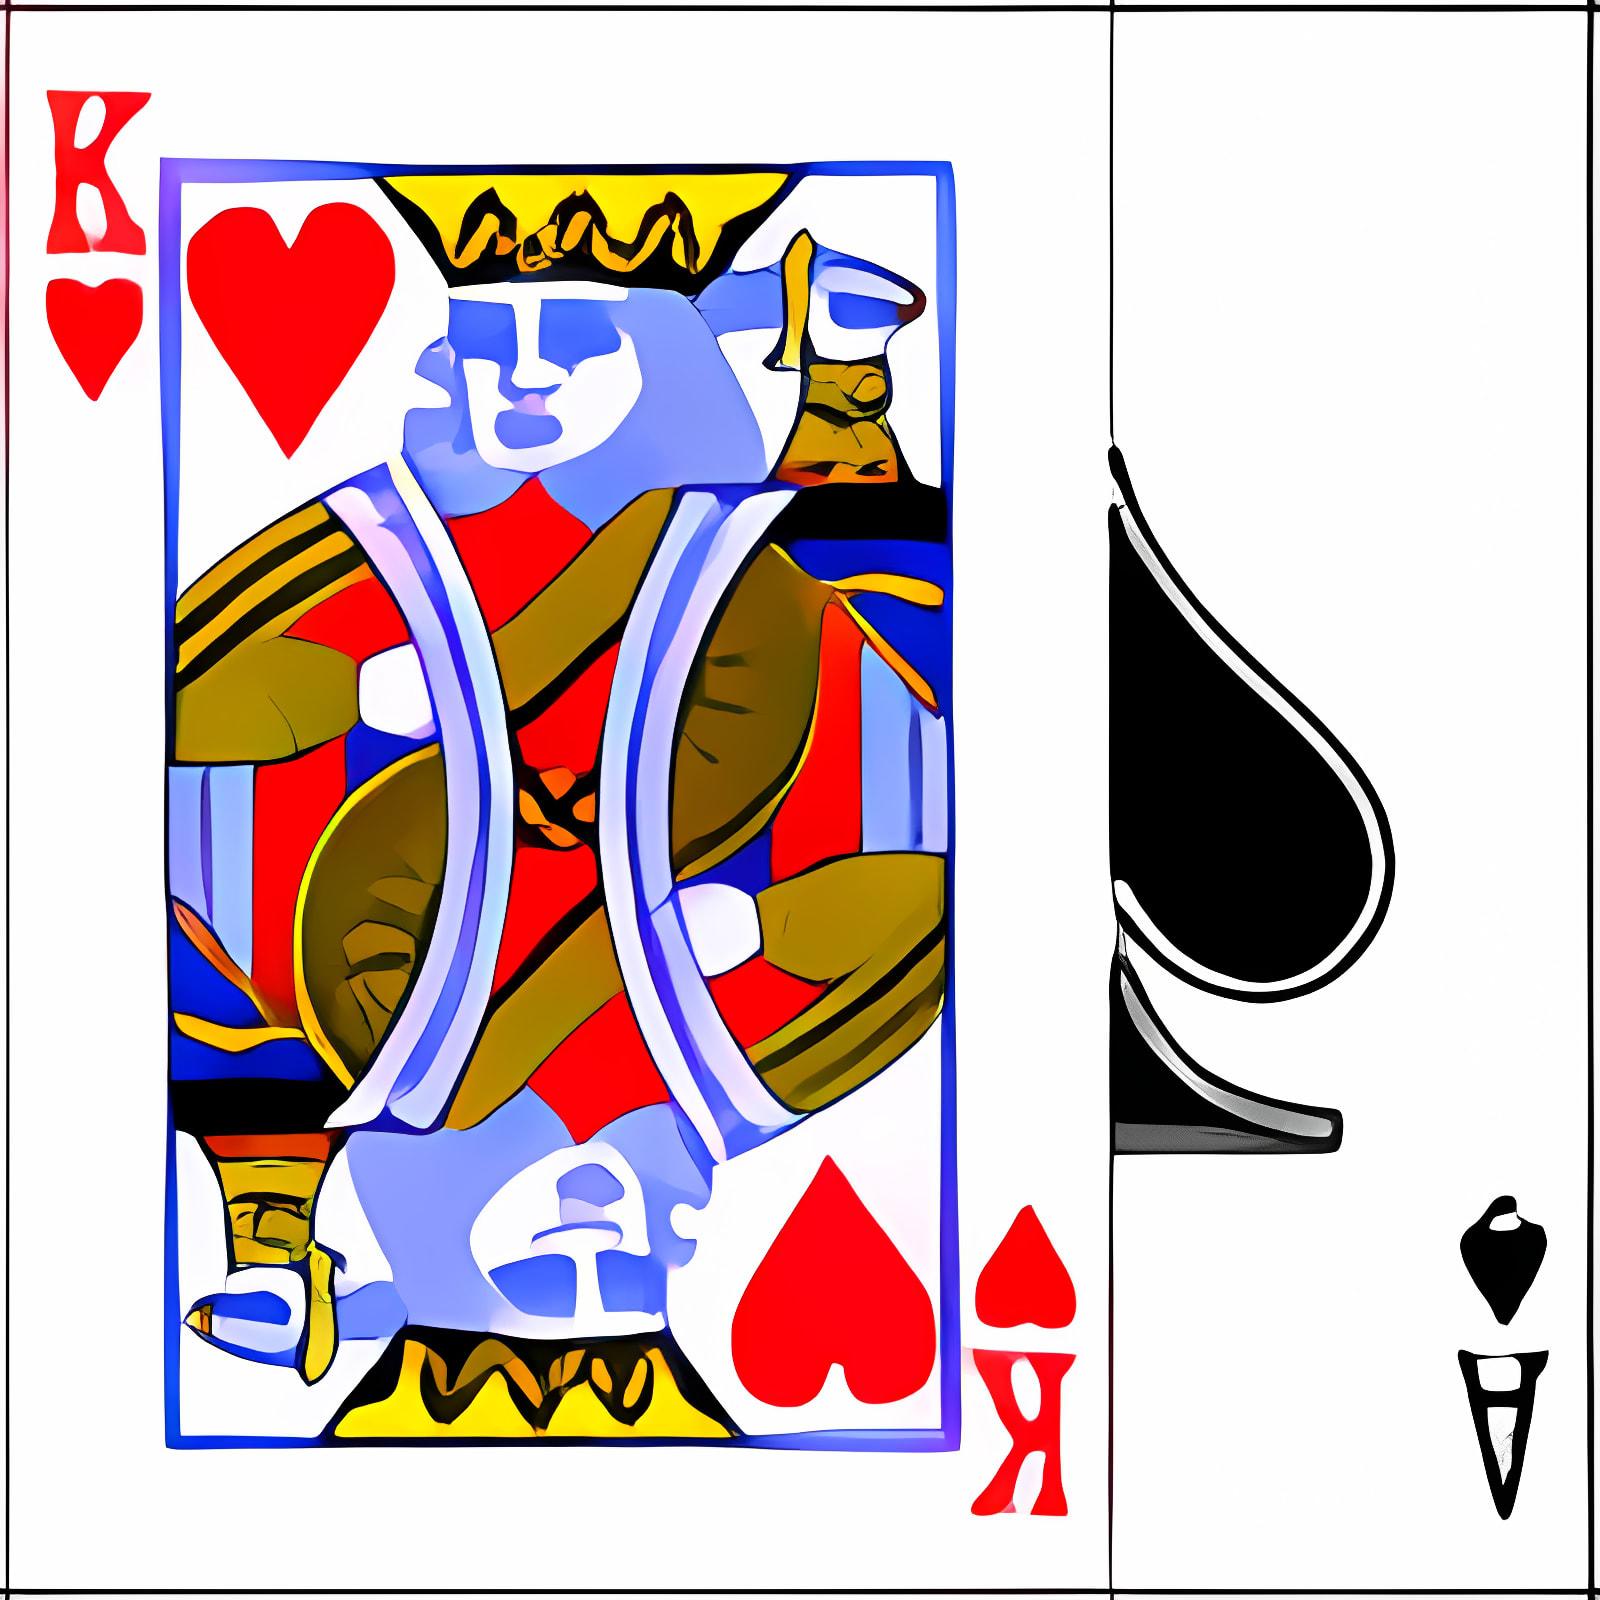 Blackjack simulator for Android